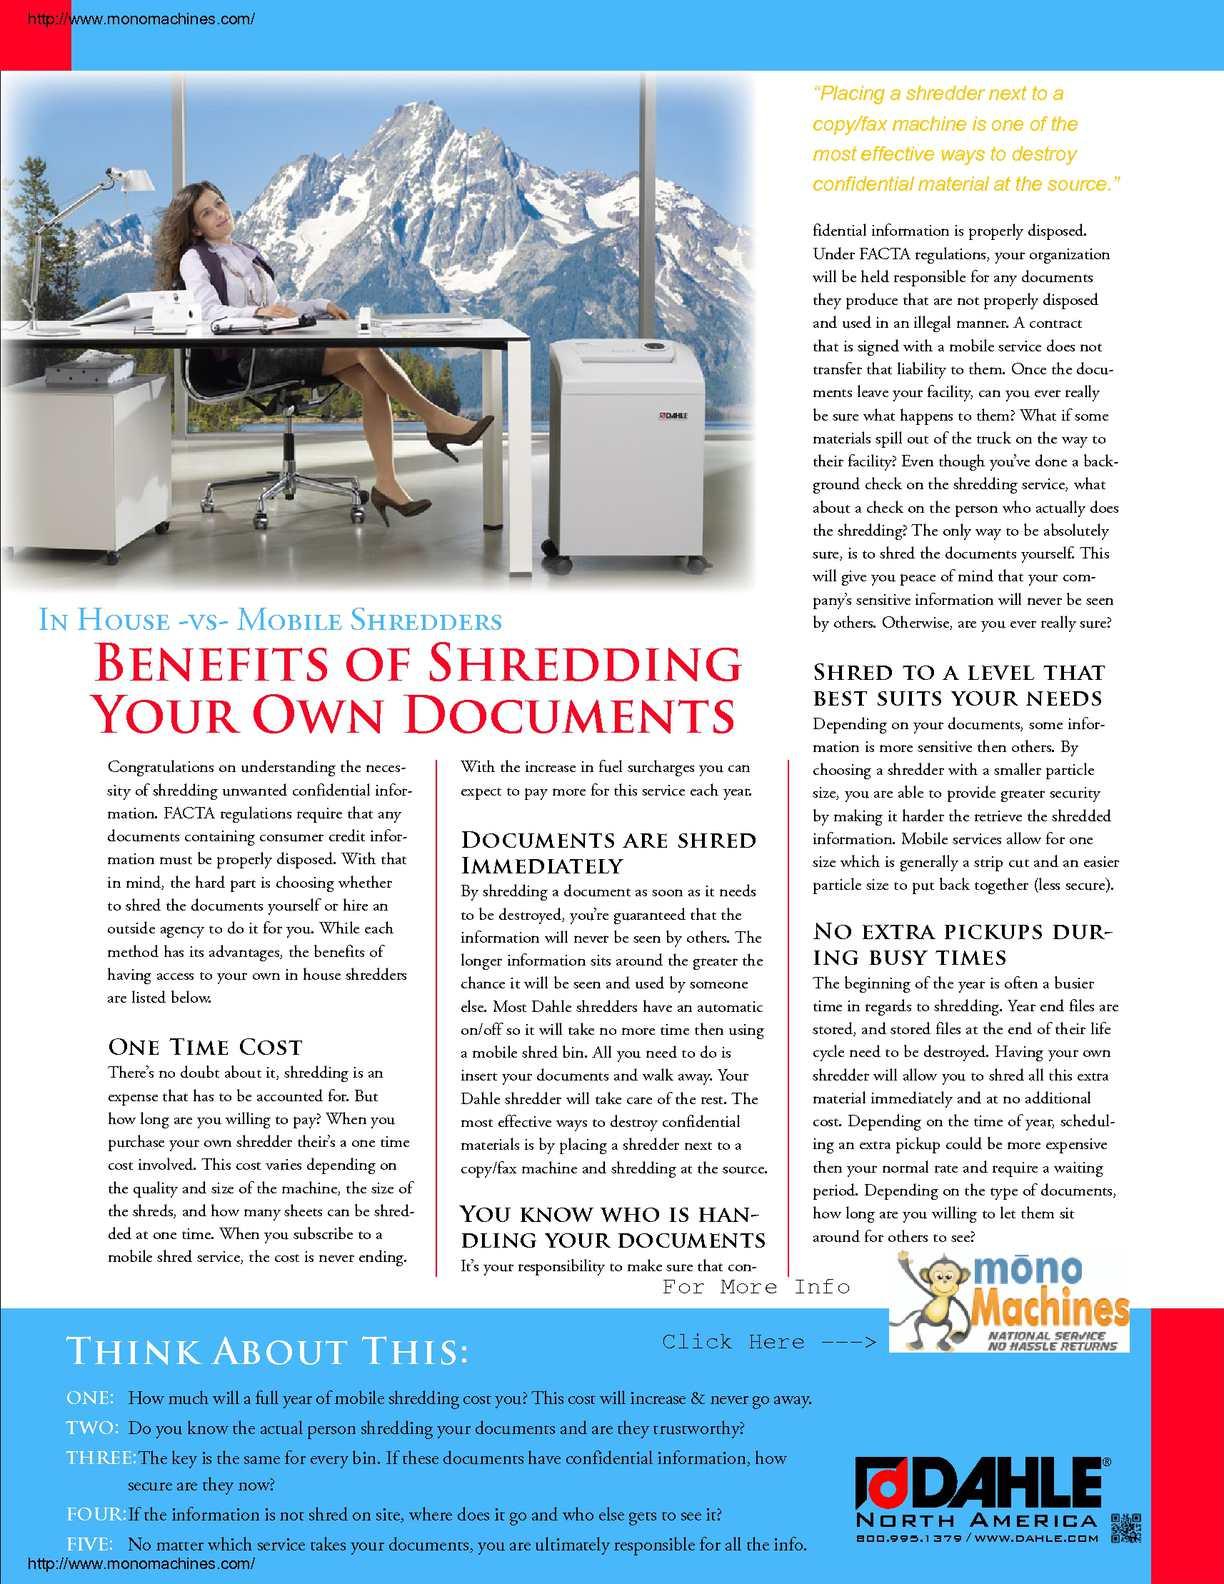 Calaméo - Dahle 40414 Shredder In-house Benefits